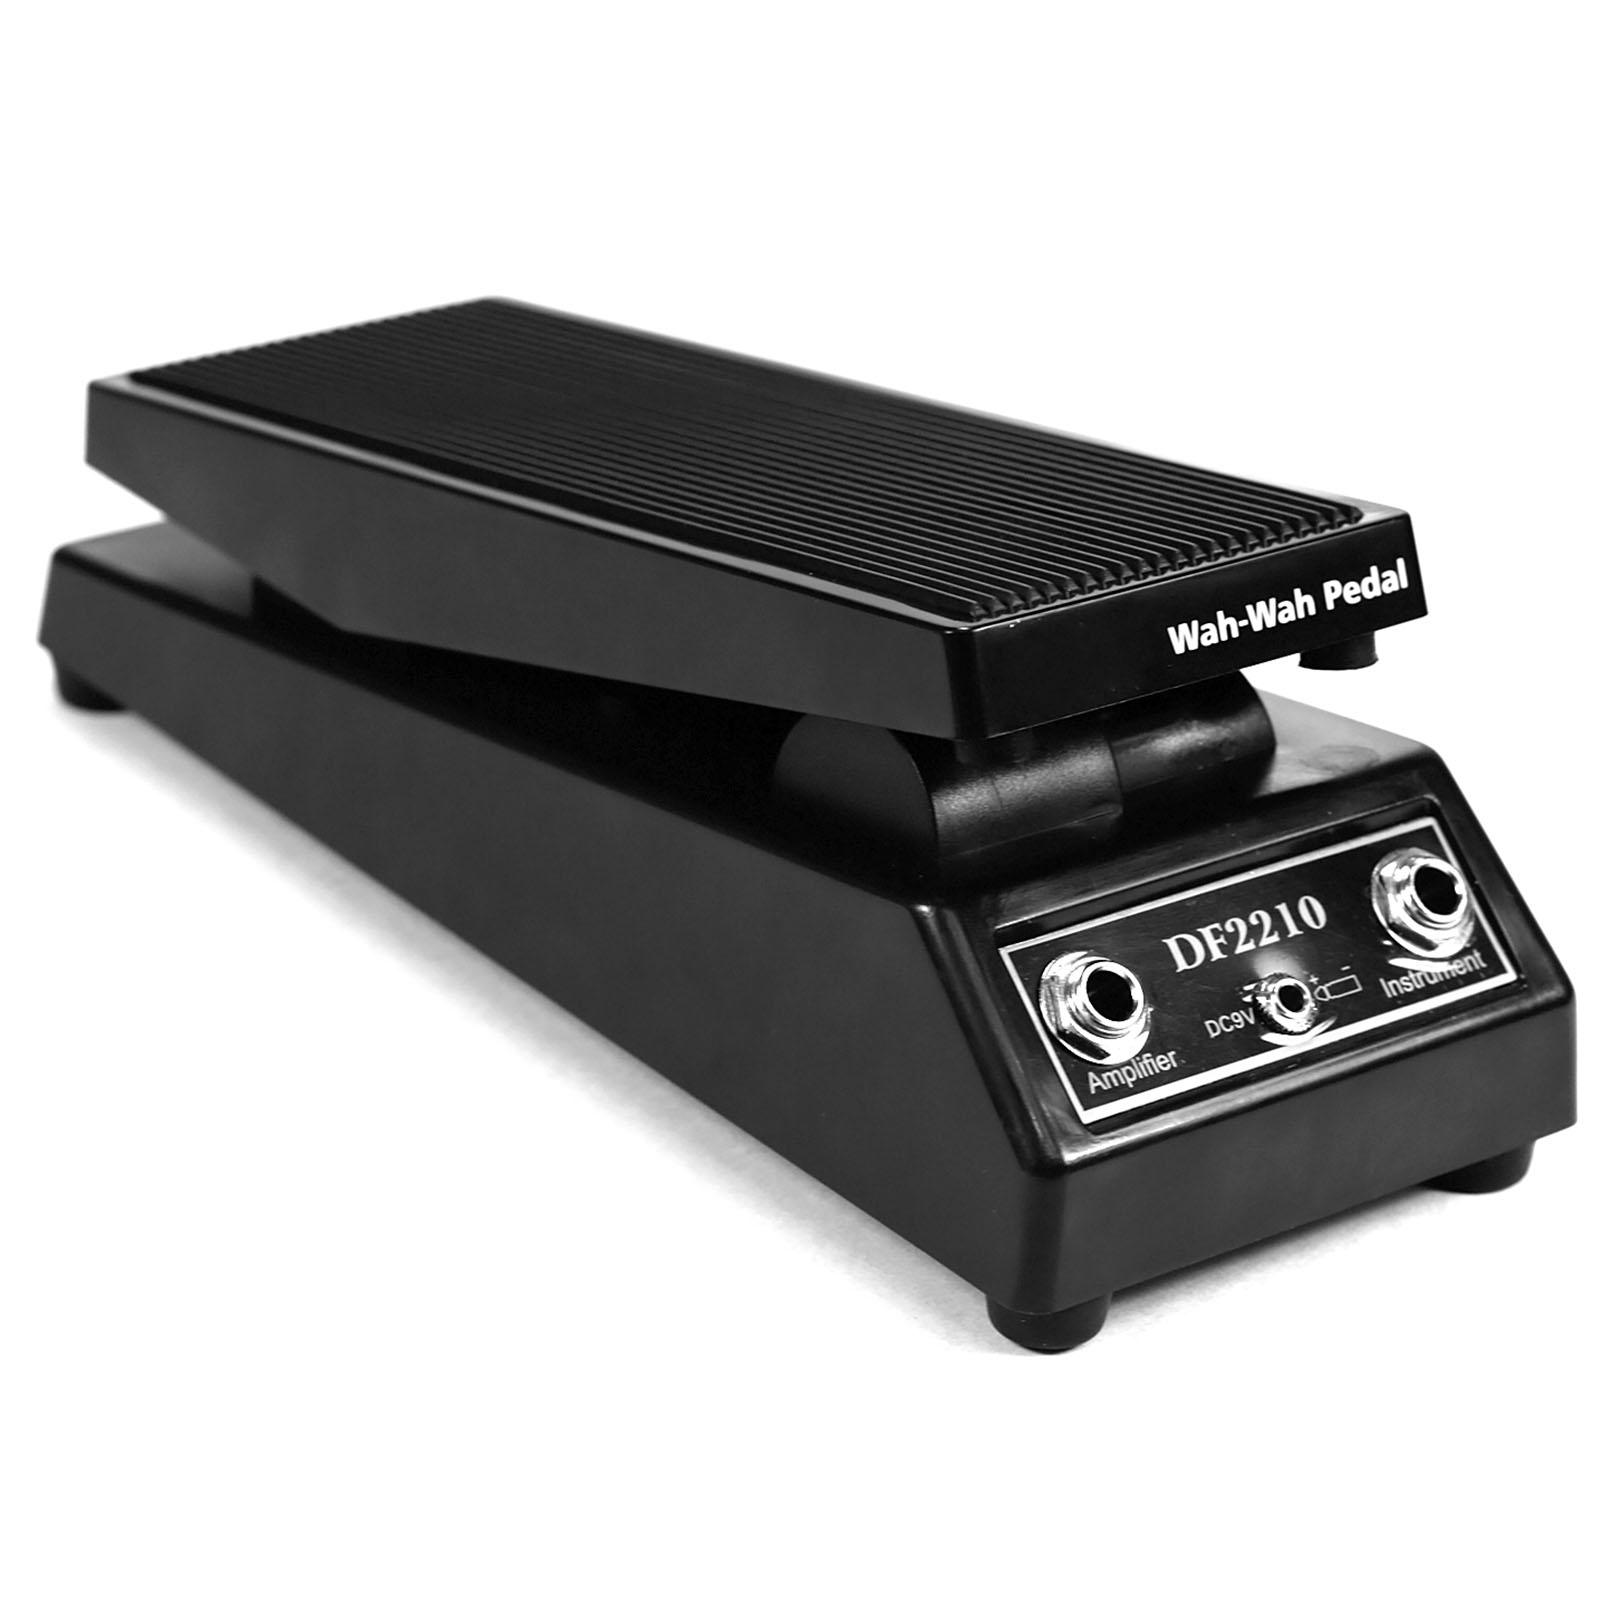 wah wah sound volume electric guitar fx effect pedal black heavy duty ebay. Black Bedroom Furniture Sets. Home Design Ideas